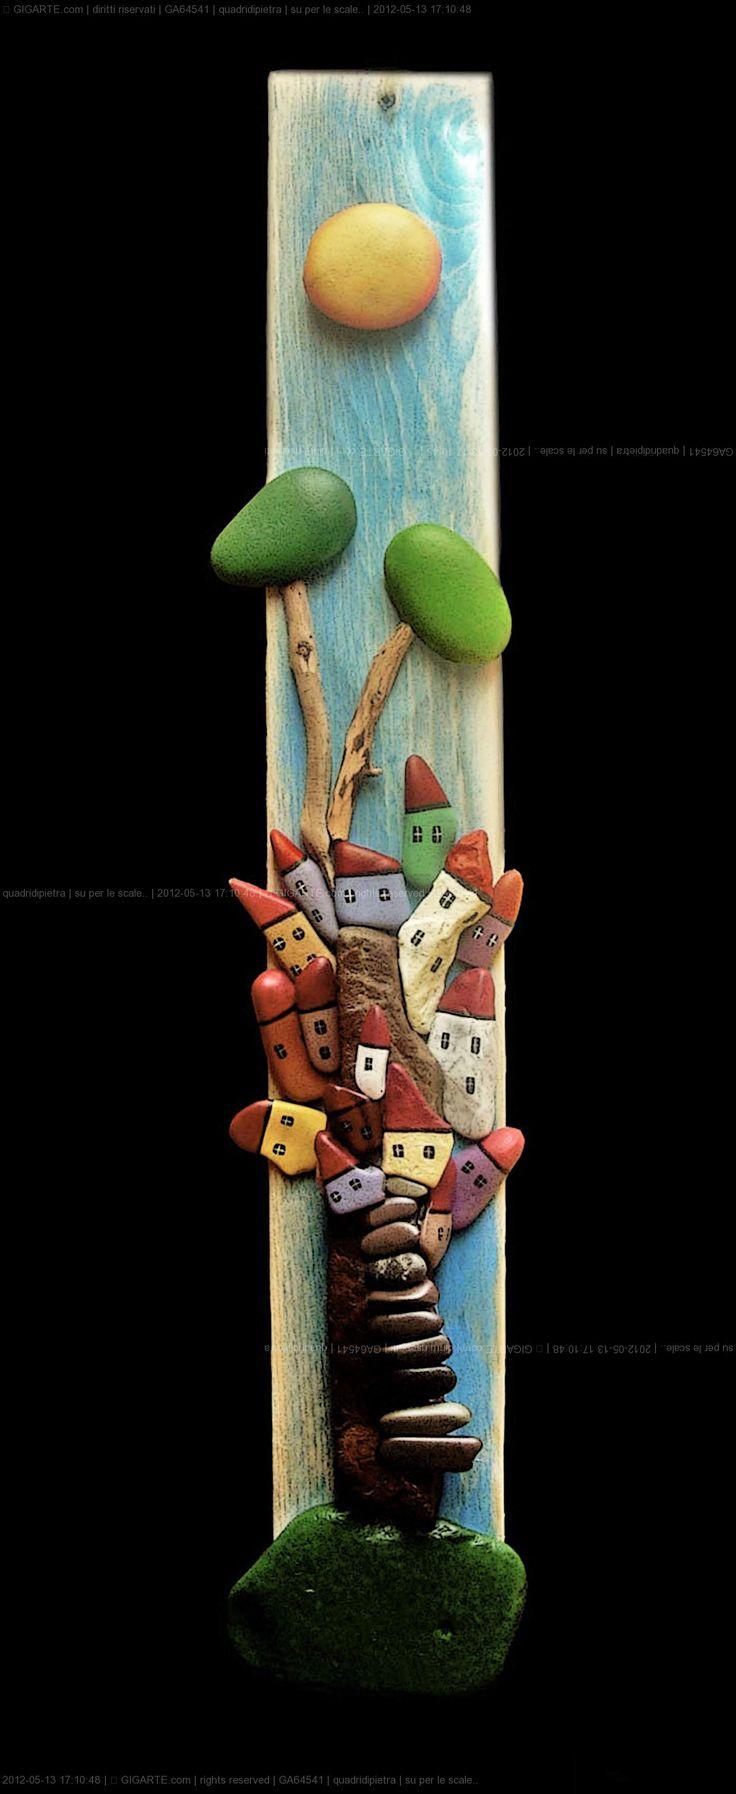 Diy Miniature Stone Houses 39 - Cutest DIY Miniature Stone House Ideas